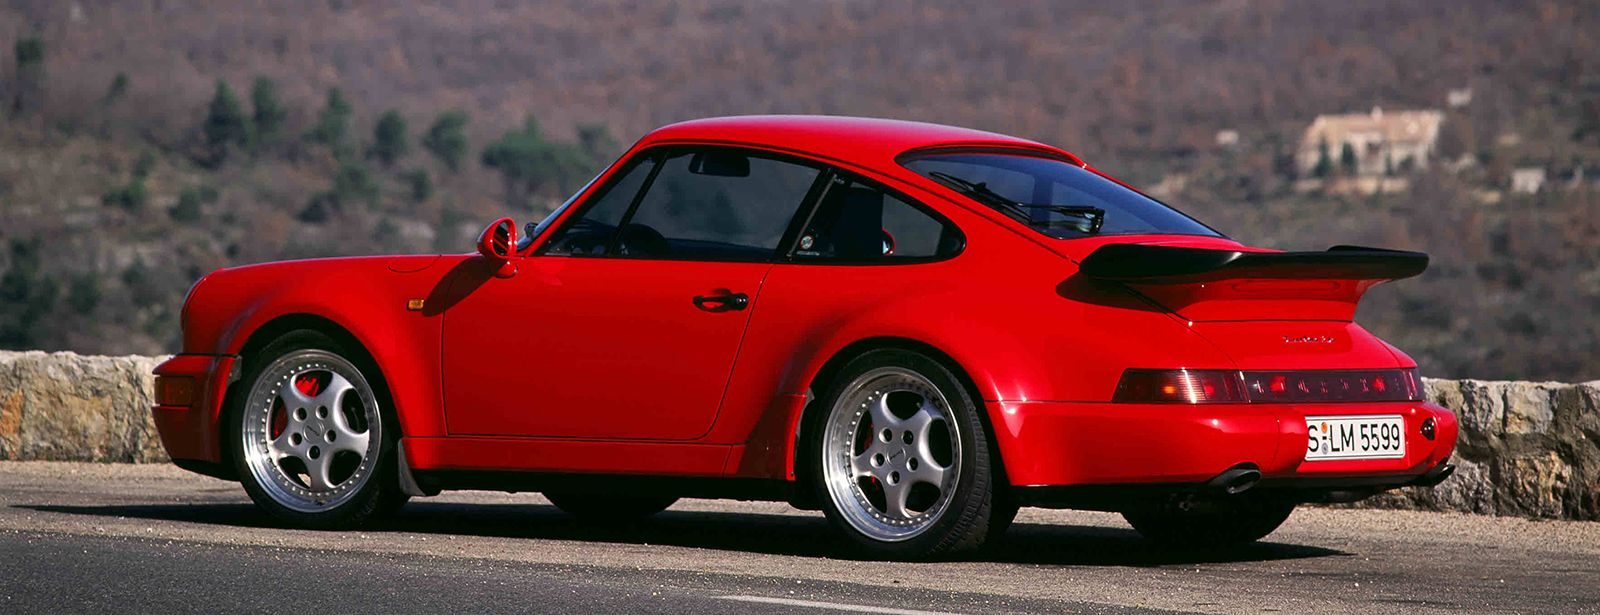 Porsche 964 Turbo 1991-1993